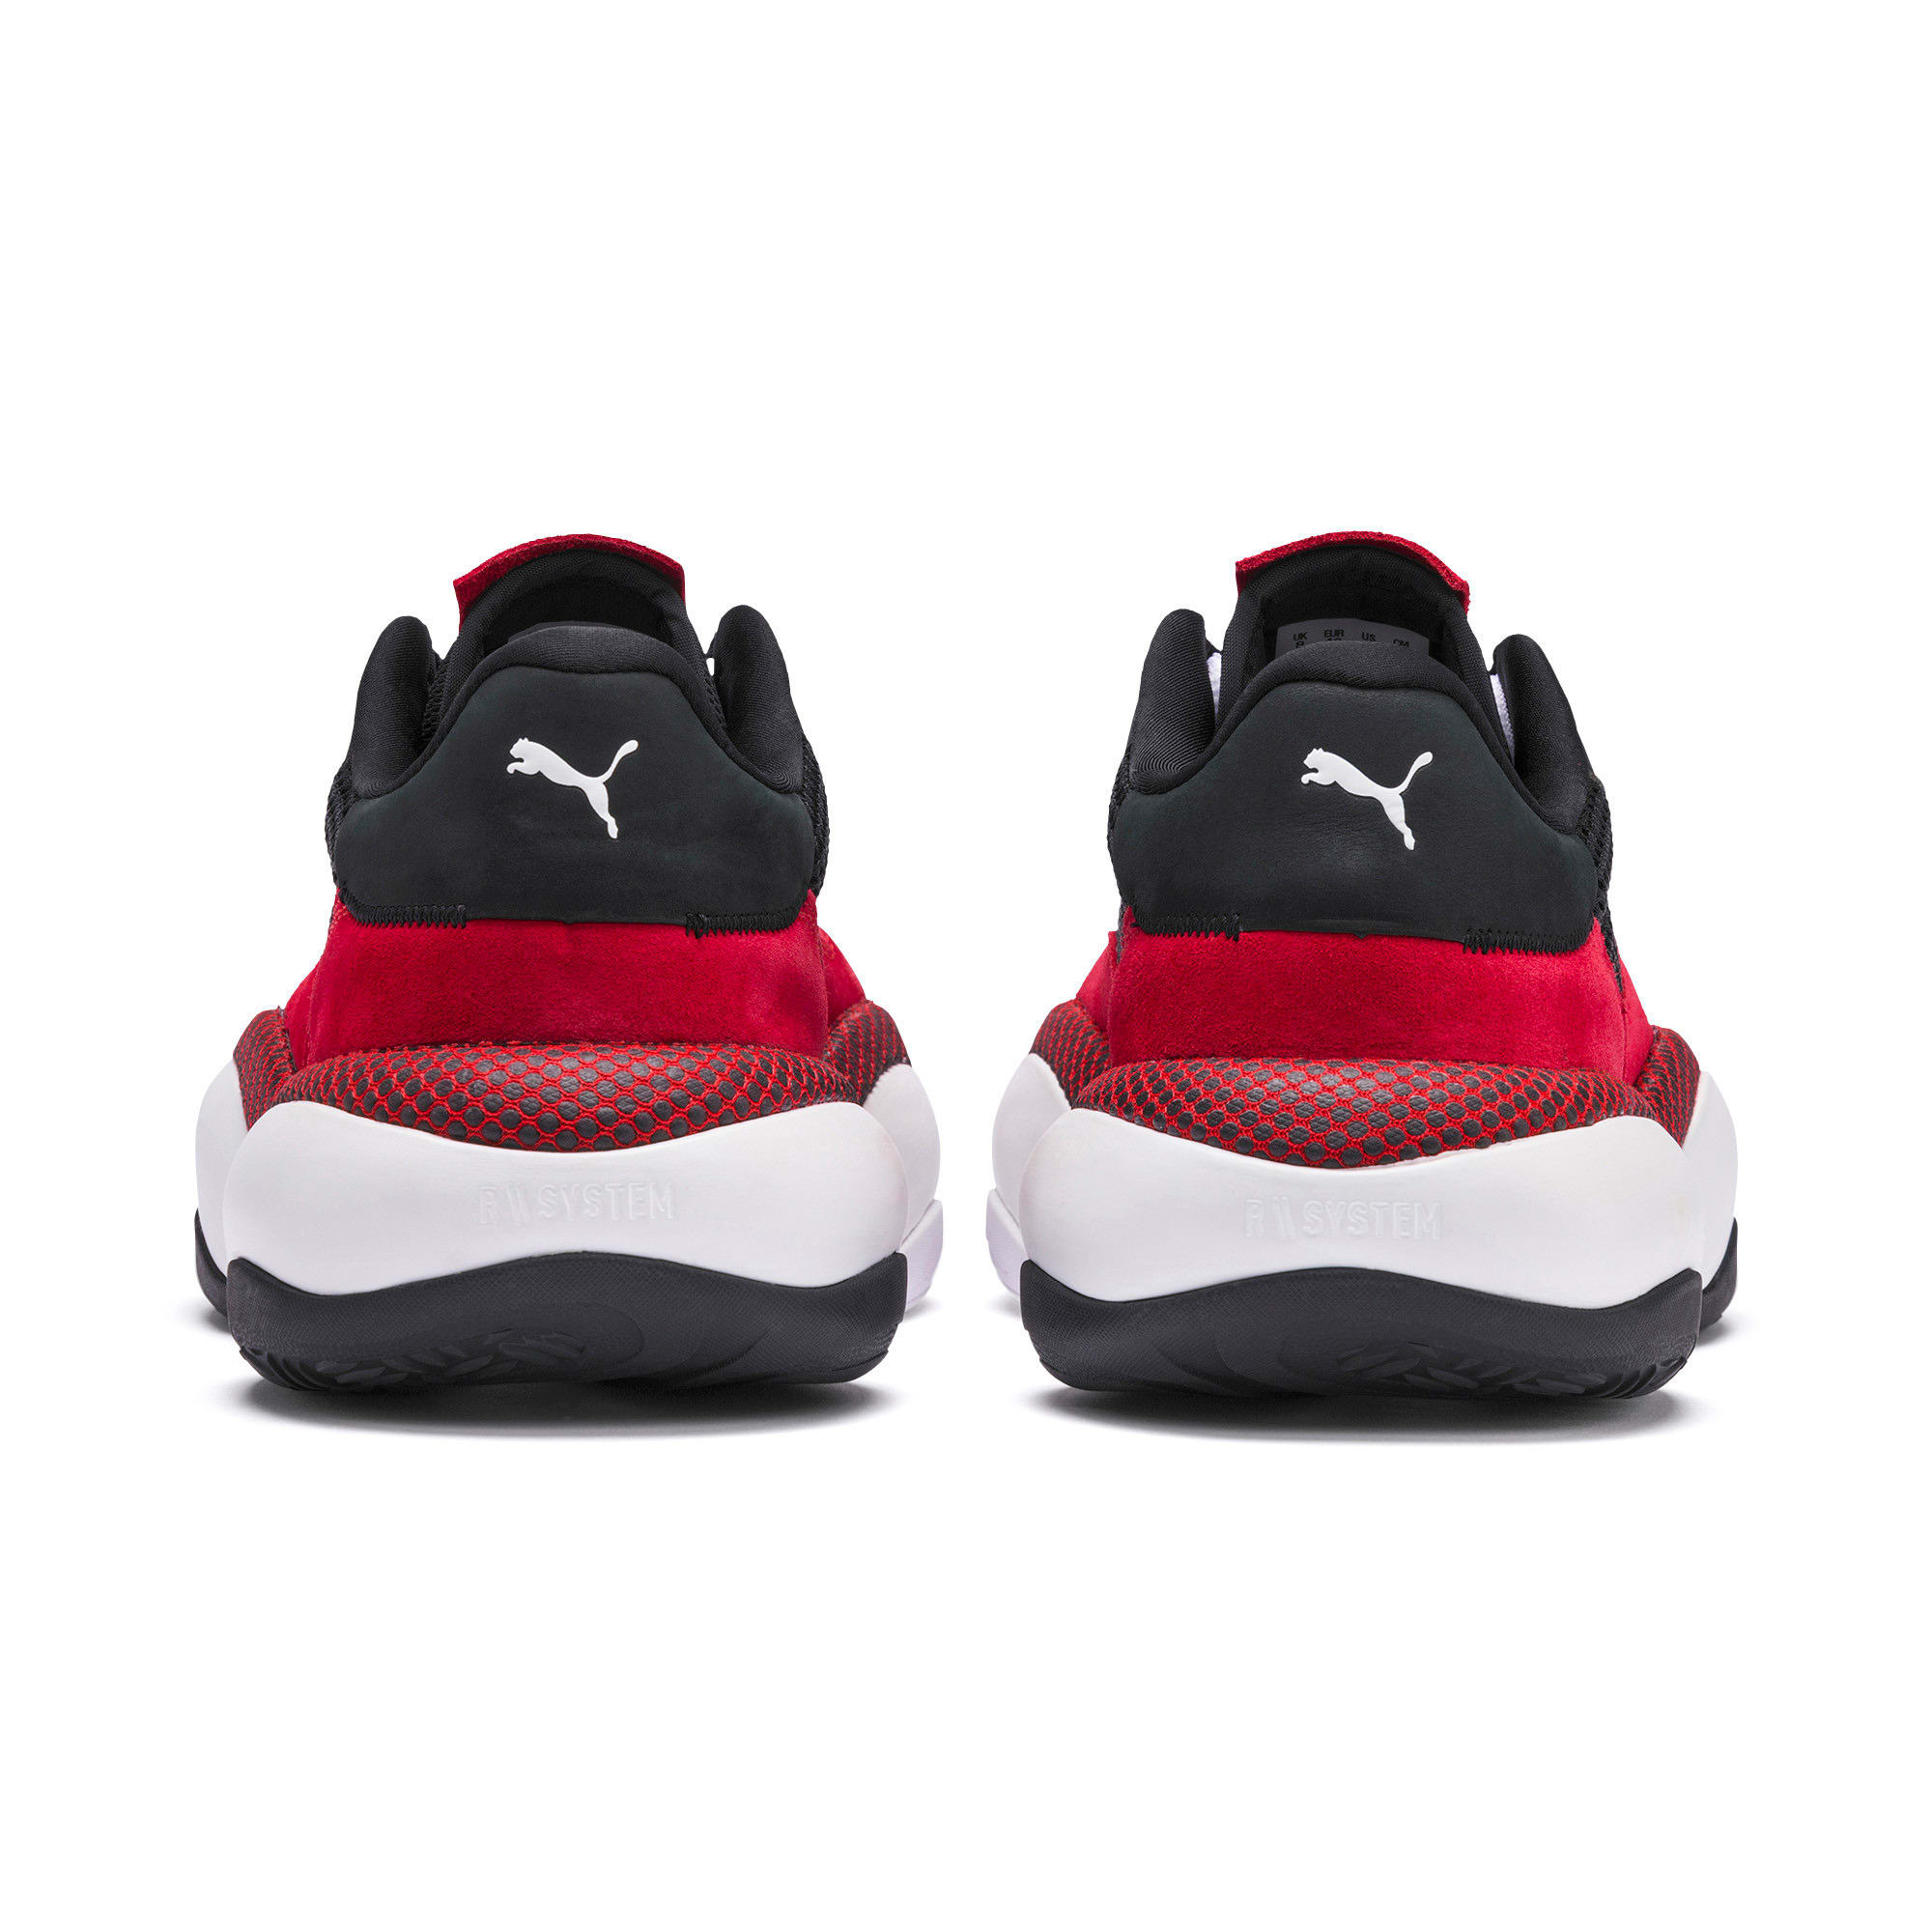 Thumbnail 4 of Alteration Blitz Sneakers, Puma Black-High Risk Red, medium